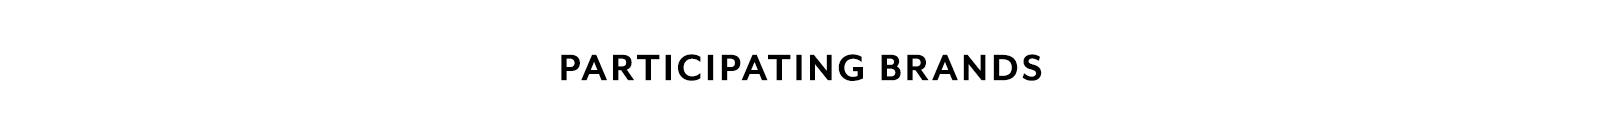 AP participating brands title banner Xmas 18